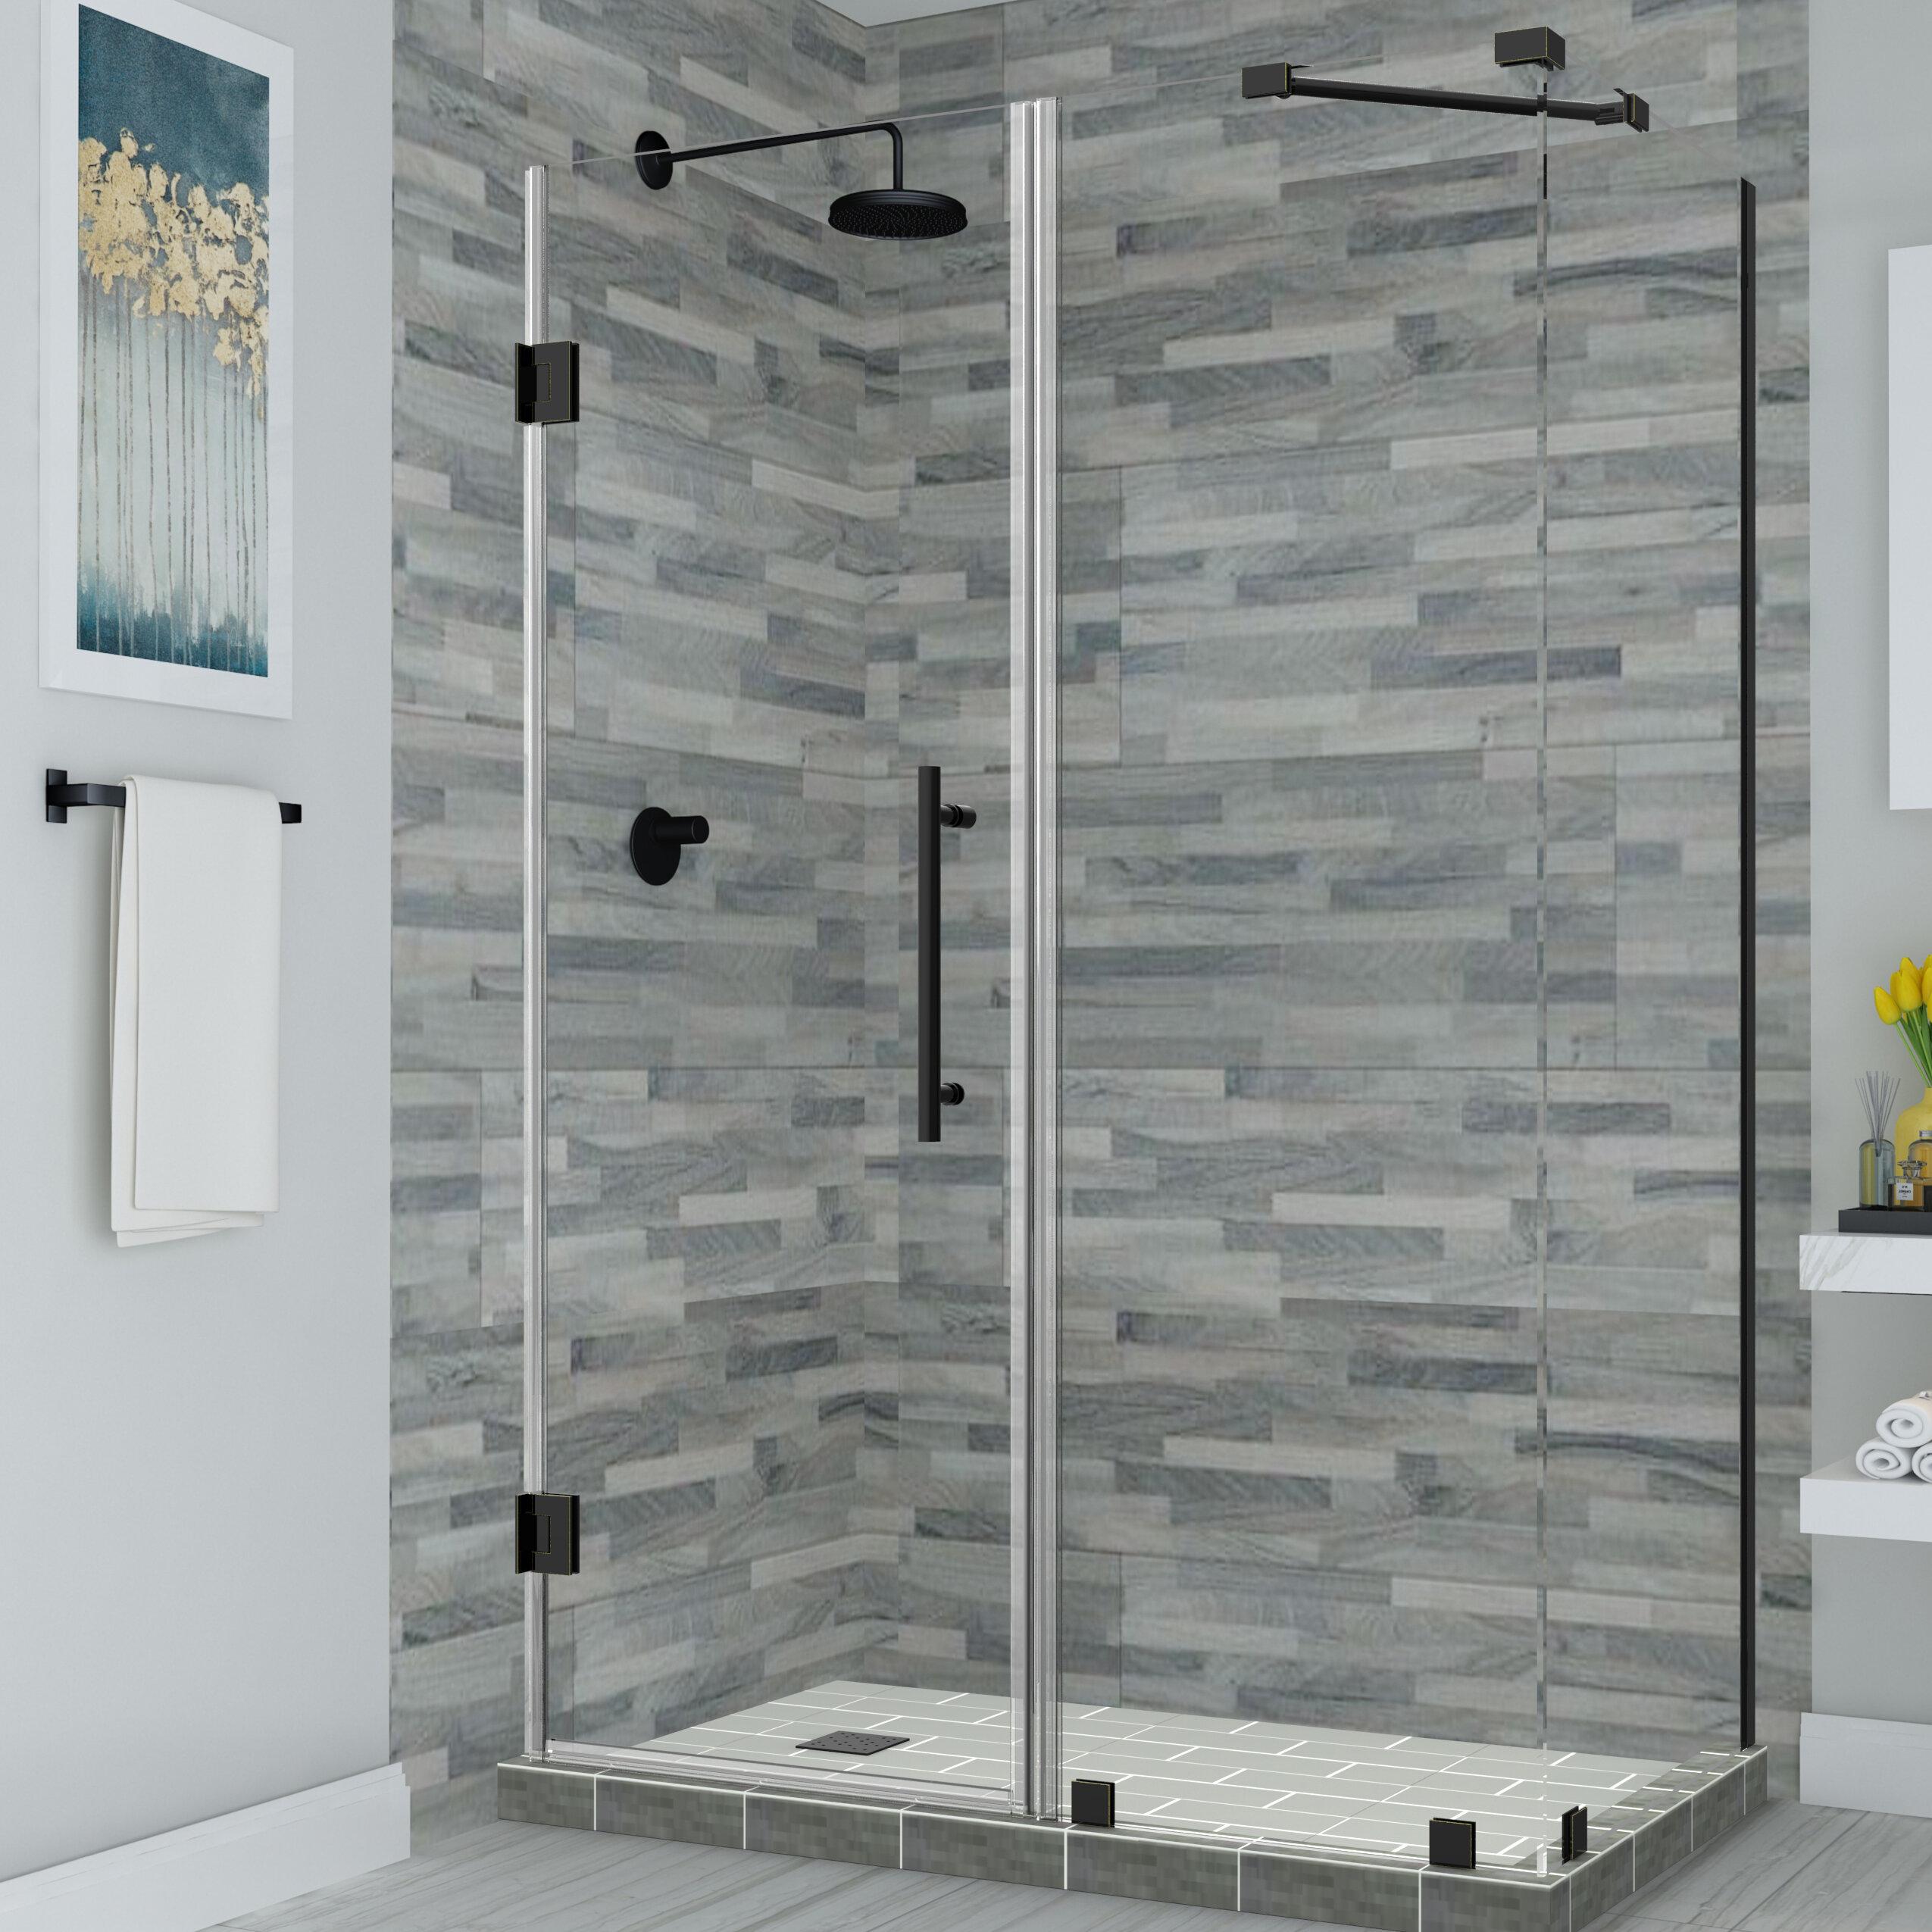 3 16 Clear Glass Hinged Corner Glass Shower Door Chrome